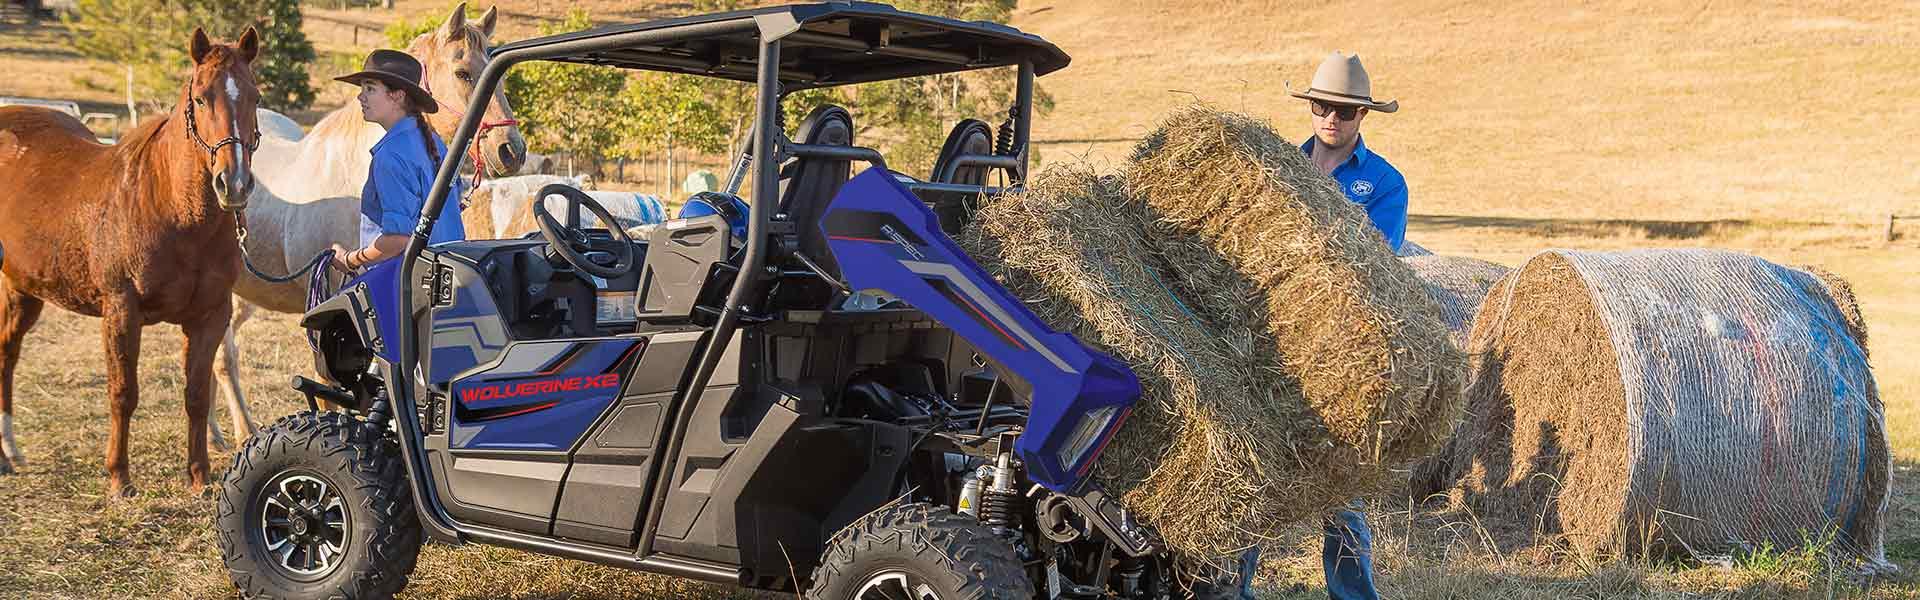 Yamaha ATV ROV Kempsey